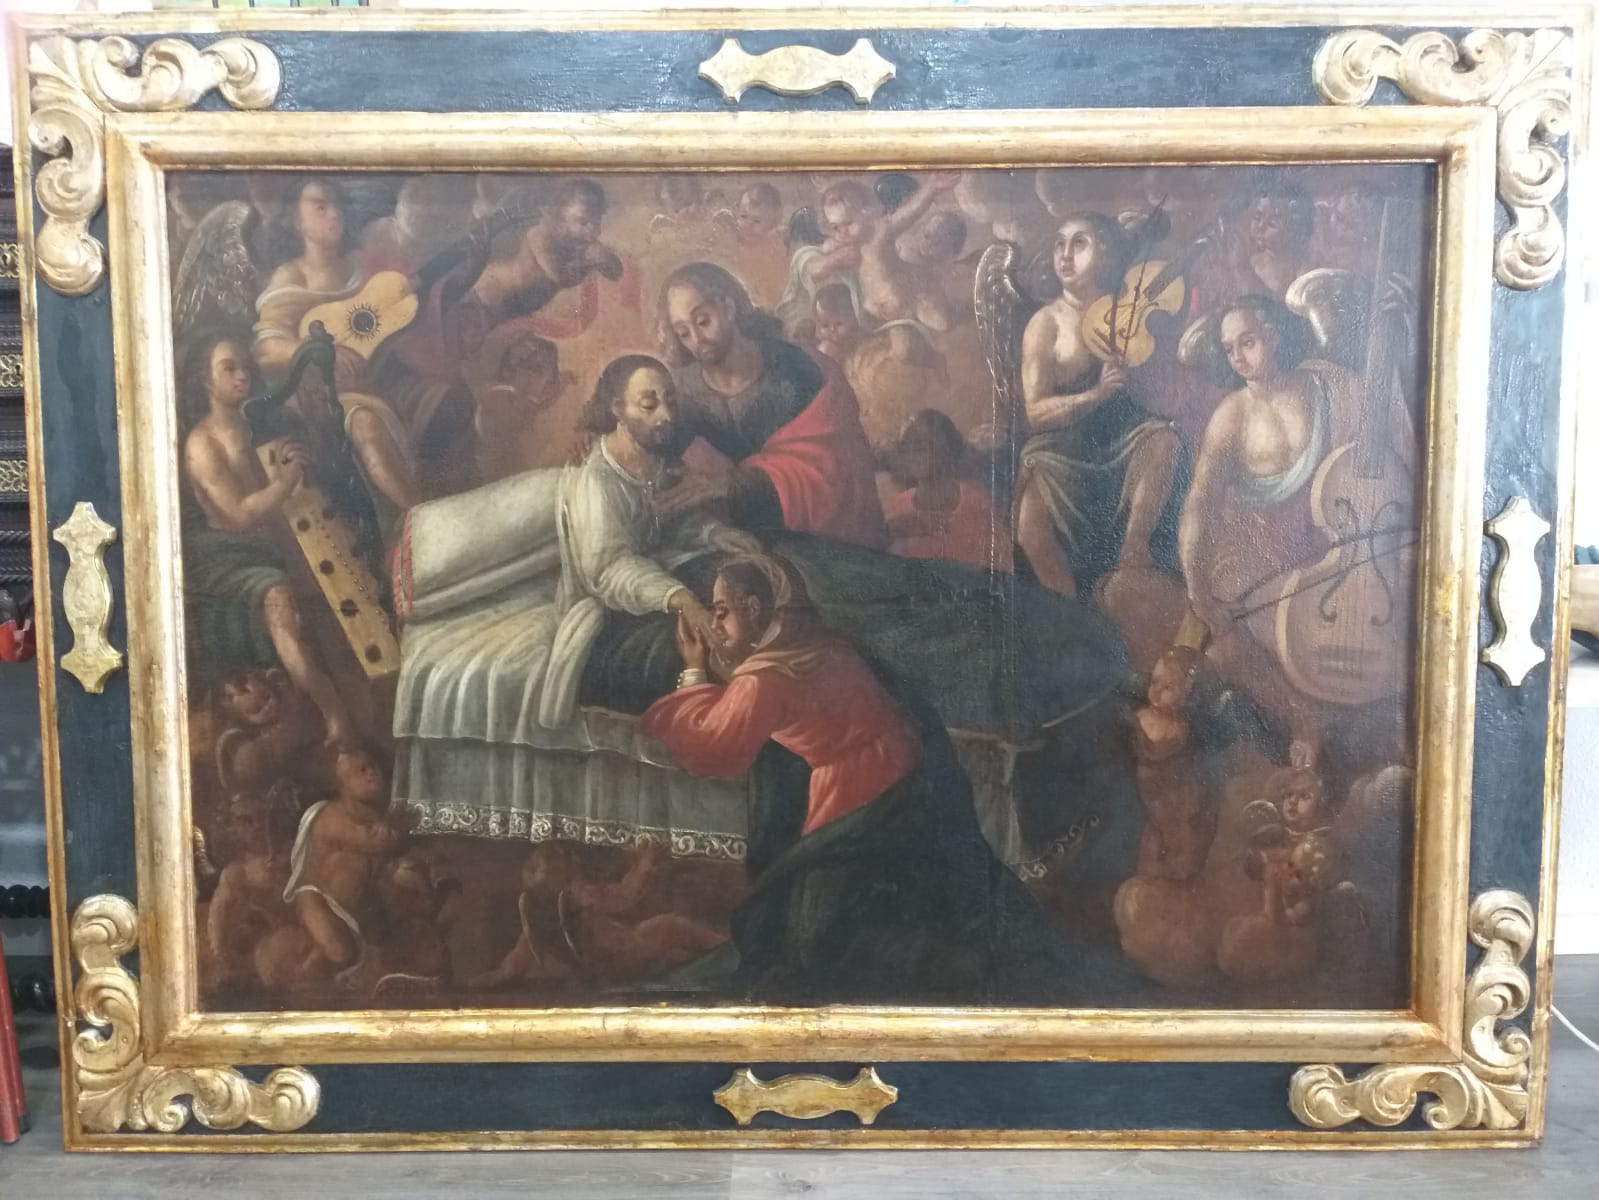 Muerte de San José. Sacristía de la Iglesia de Santa Catalina. El Bonillo (Albacete) Foto: El Parteluz S.L